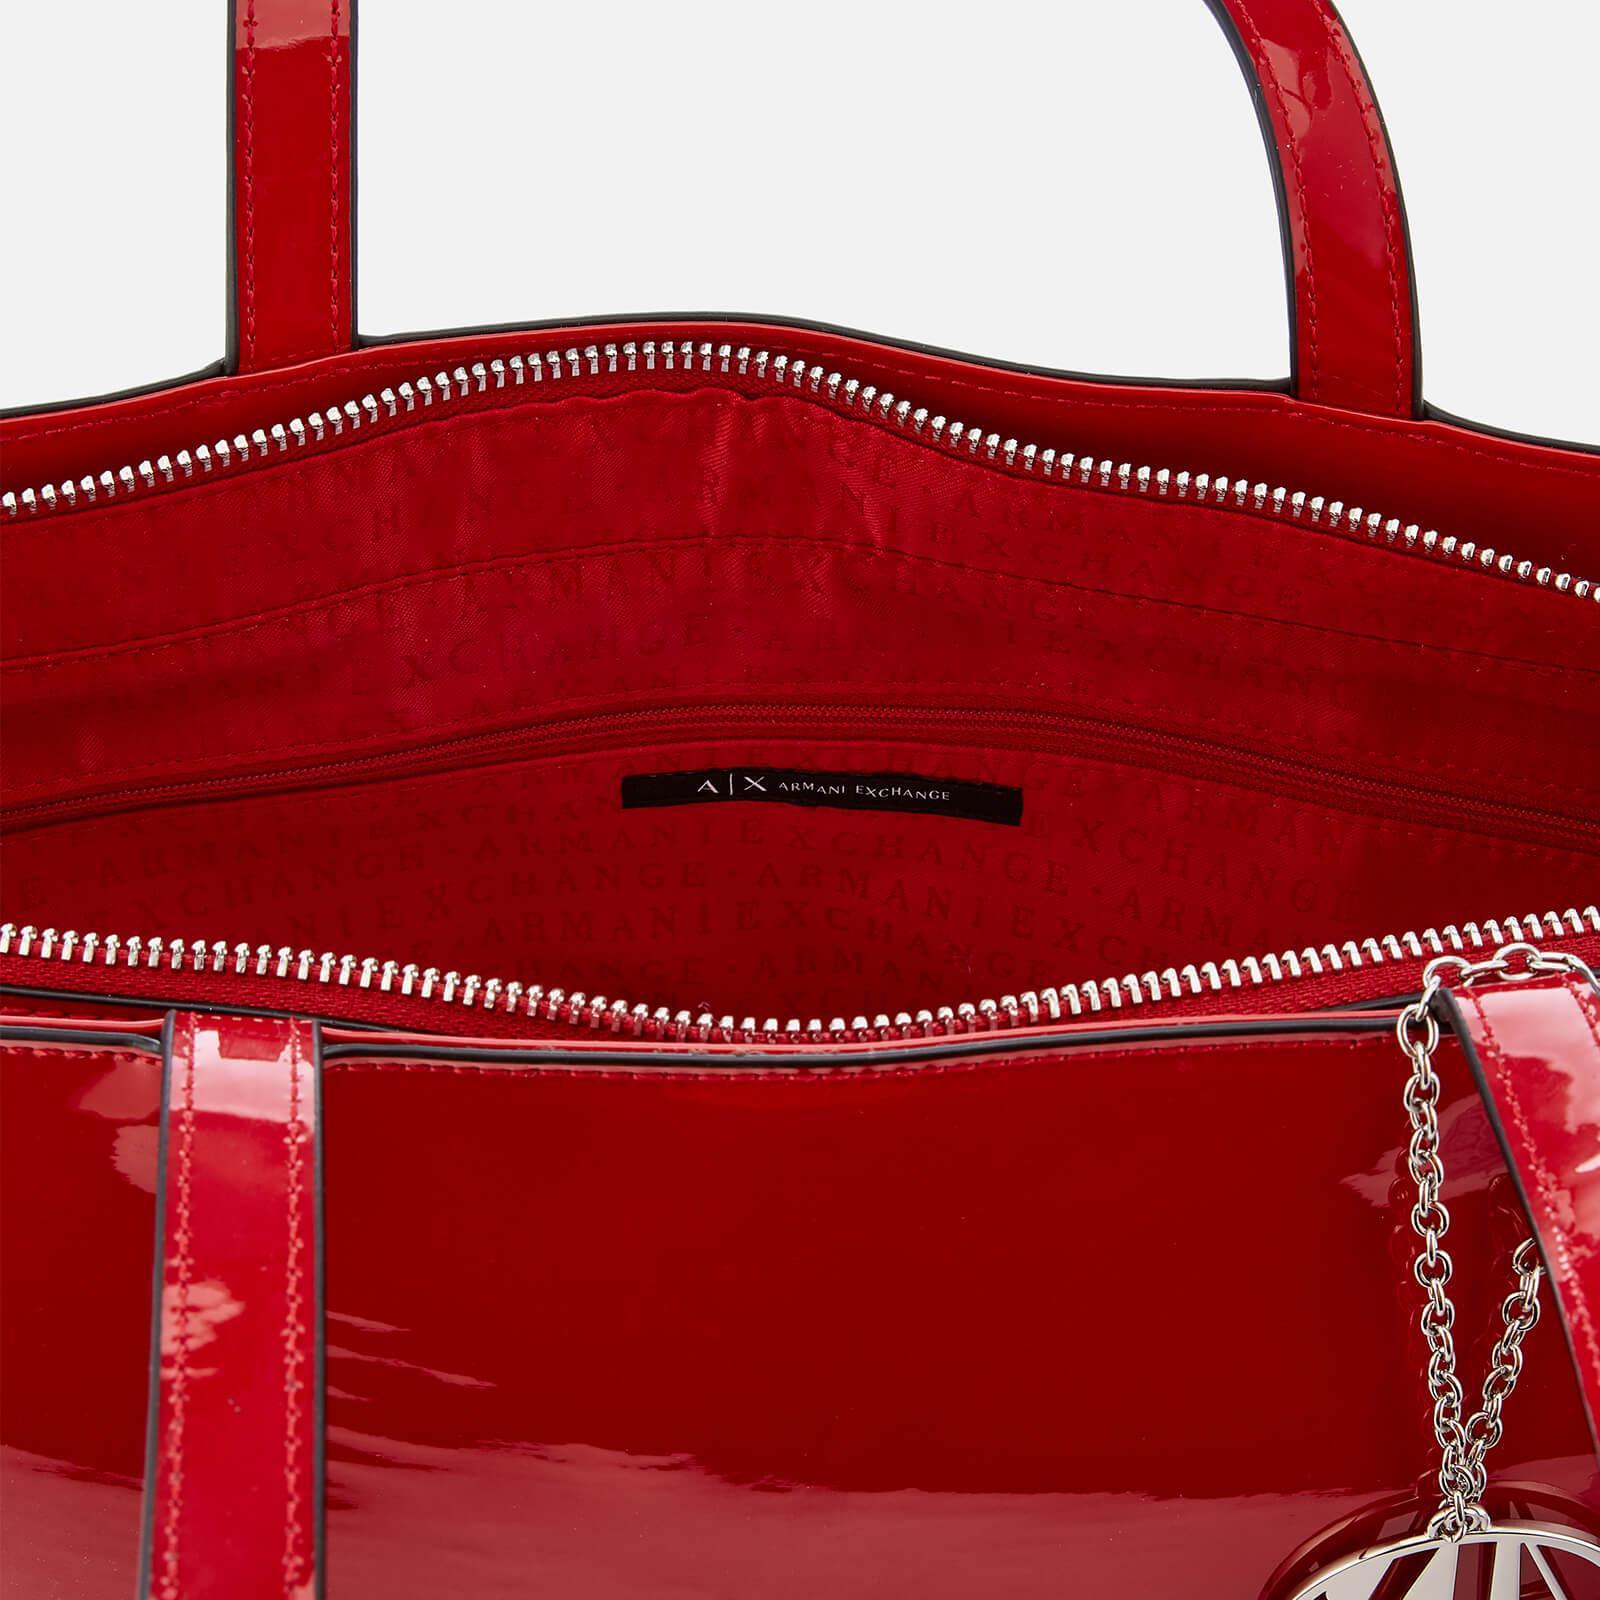 Armani Exchange - Red Patent Shopping Tote Bag - Lyst. View fullscreen 5e1b269eb903f